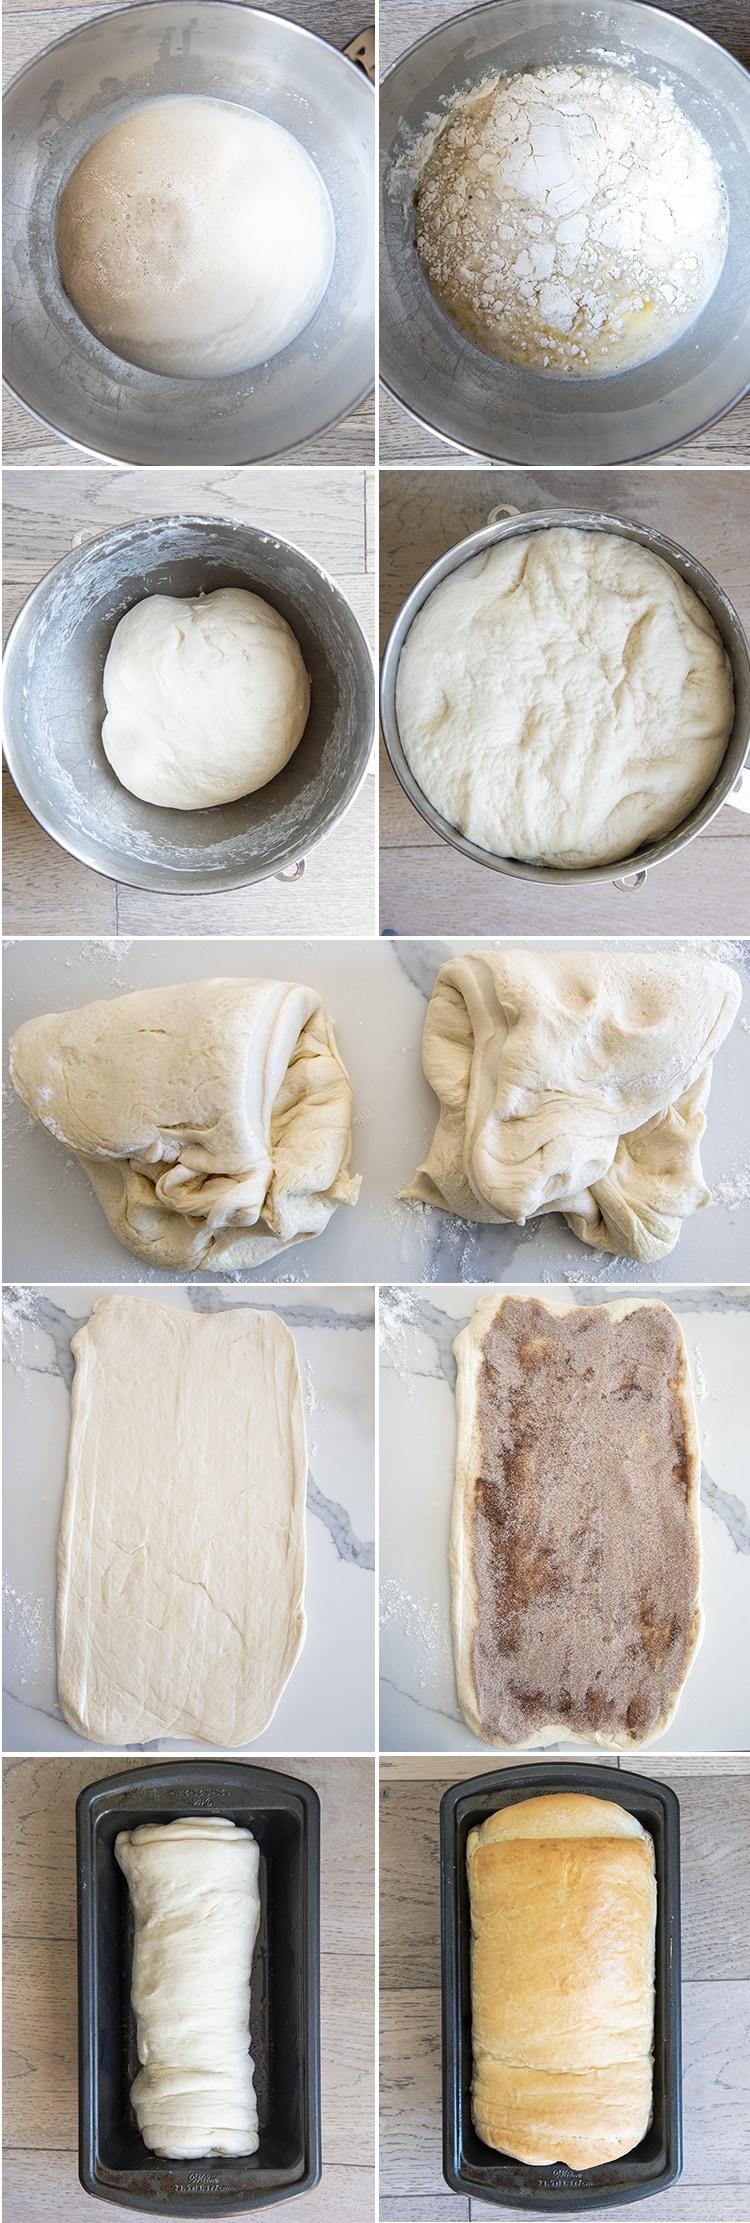 Step by step photos how to make cinnamon swirl bread